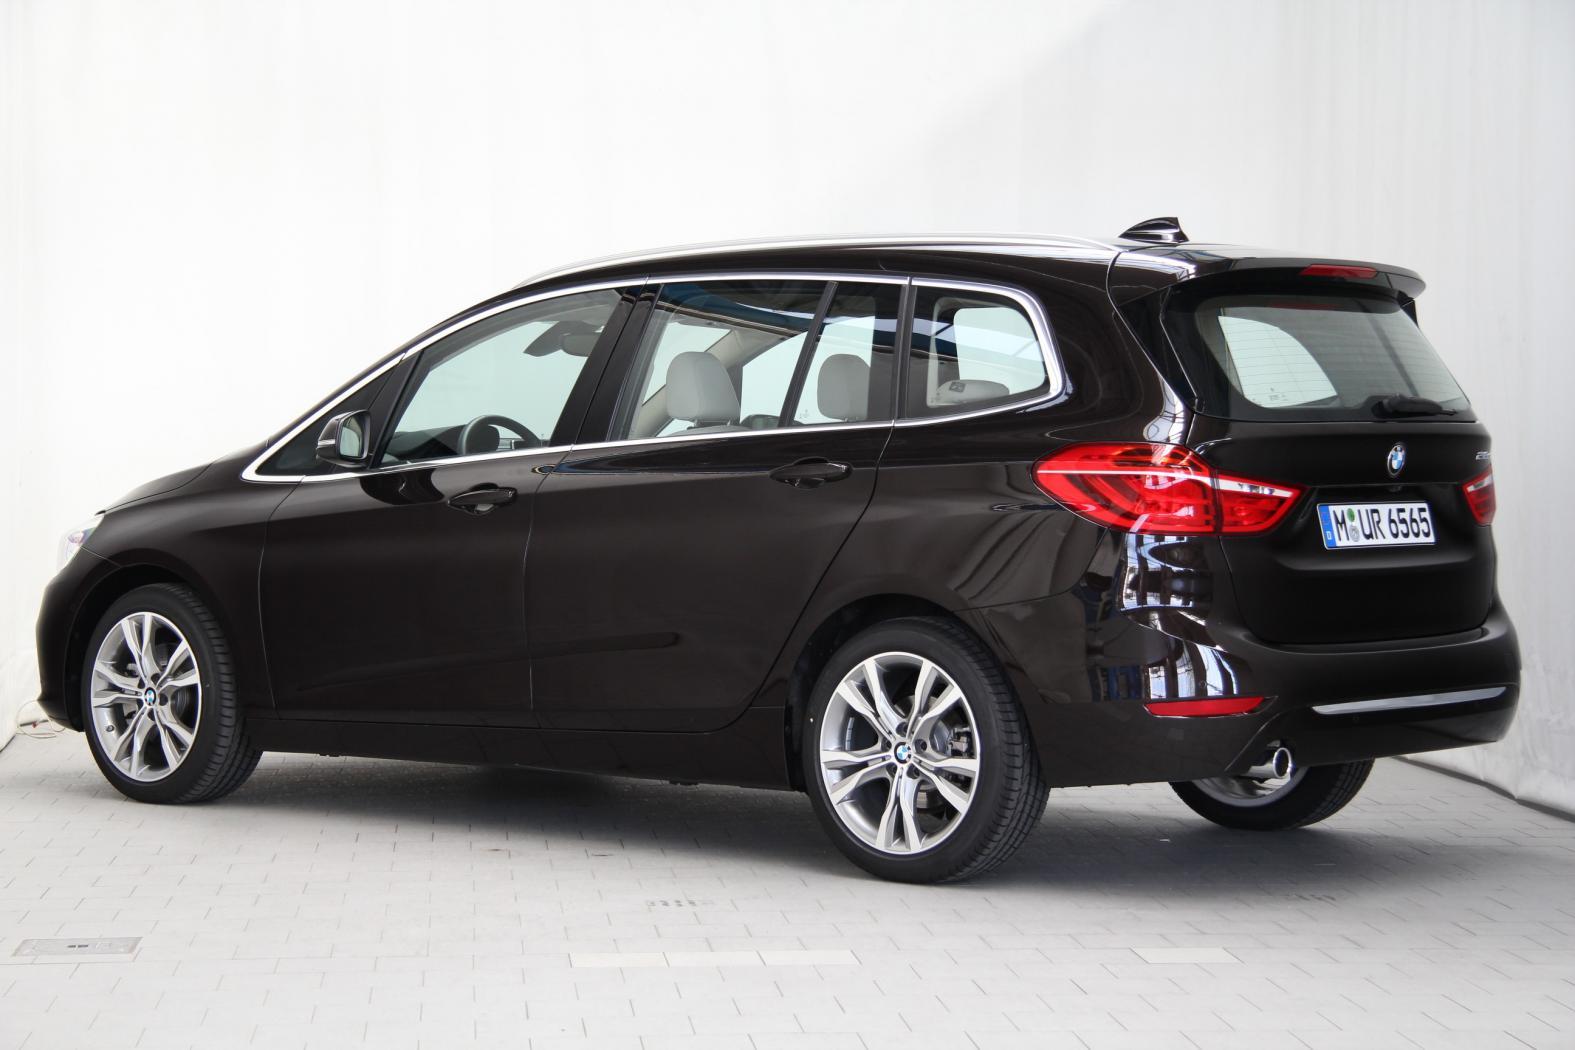 Fiche-occasion-BMW-Serie-2-Active-Tourer-F45-et-Gran-Tourer-F46-5.jpeg